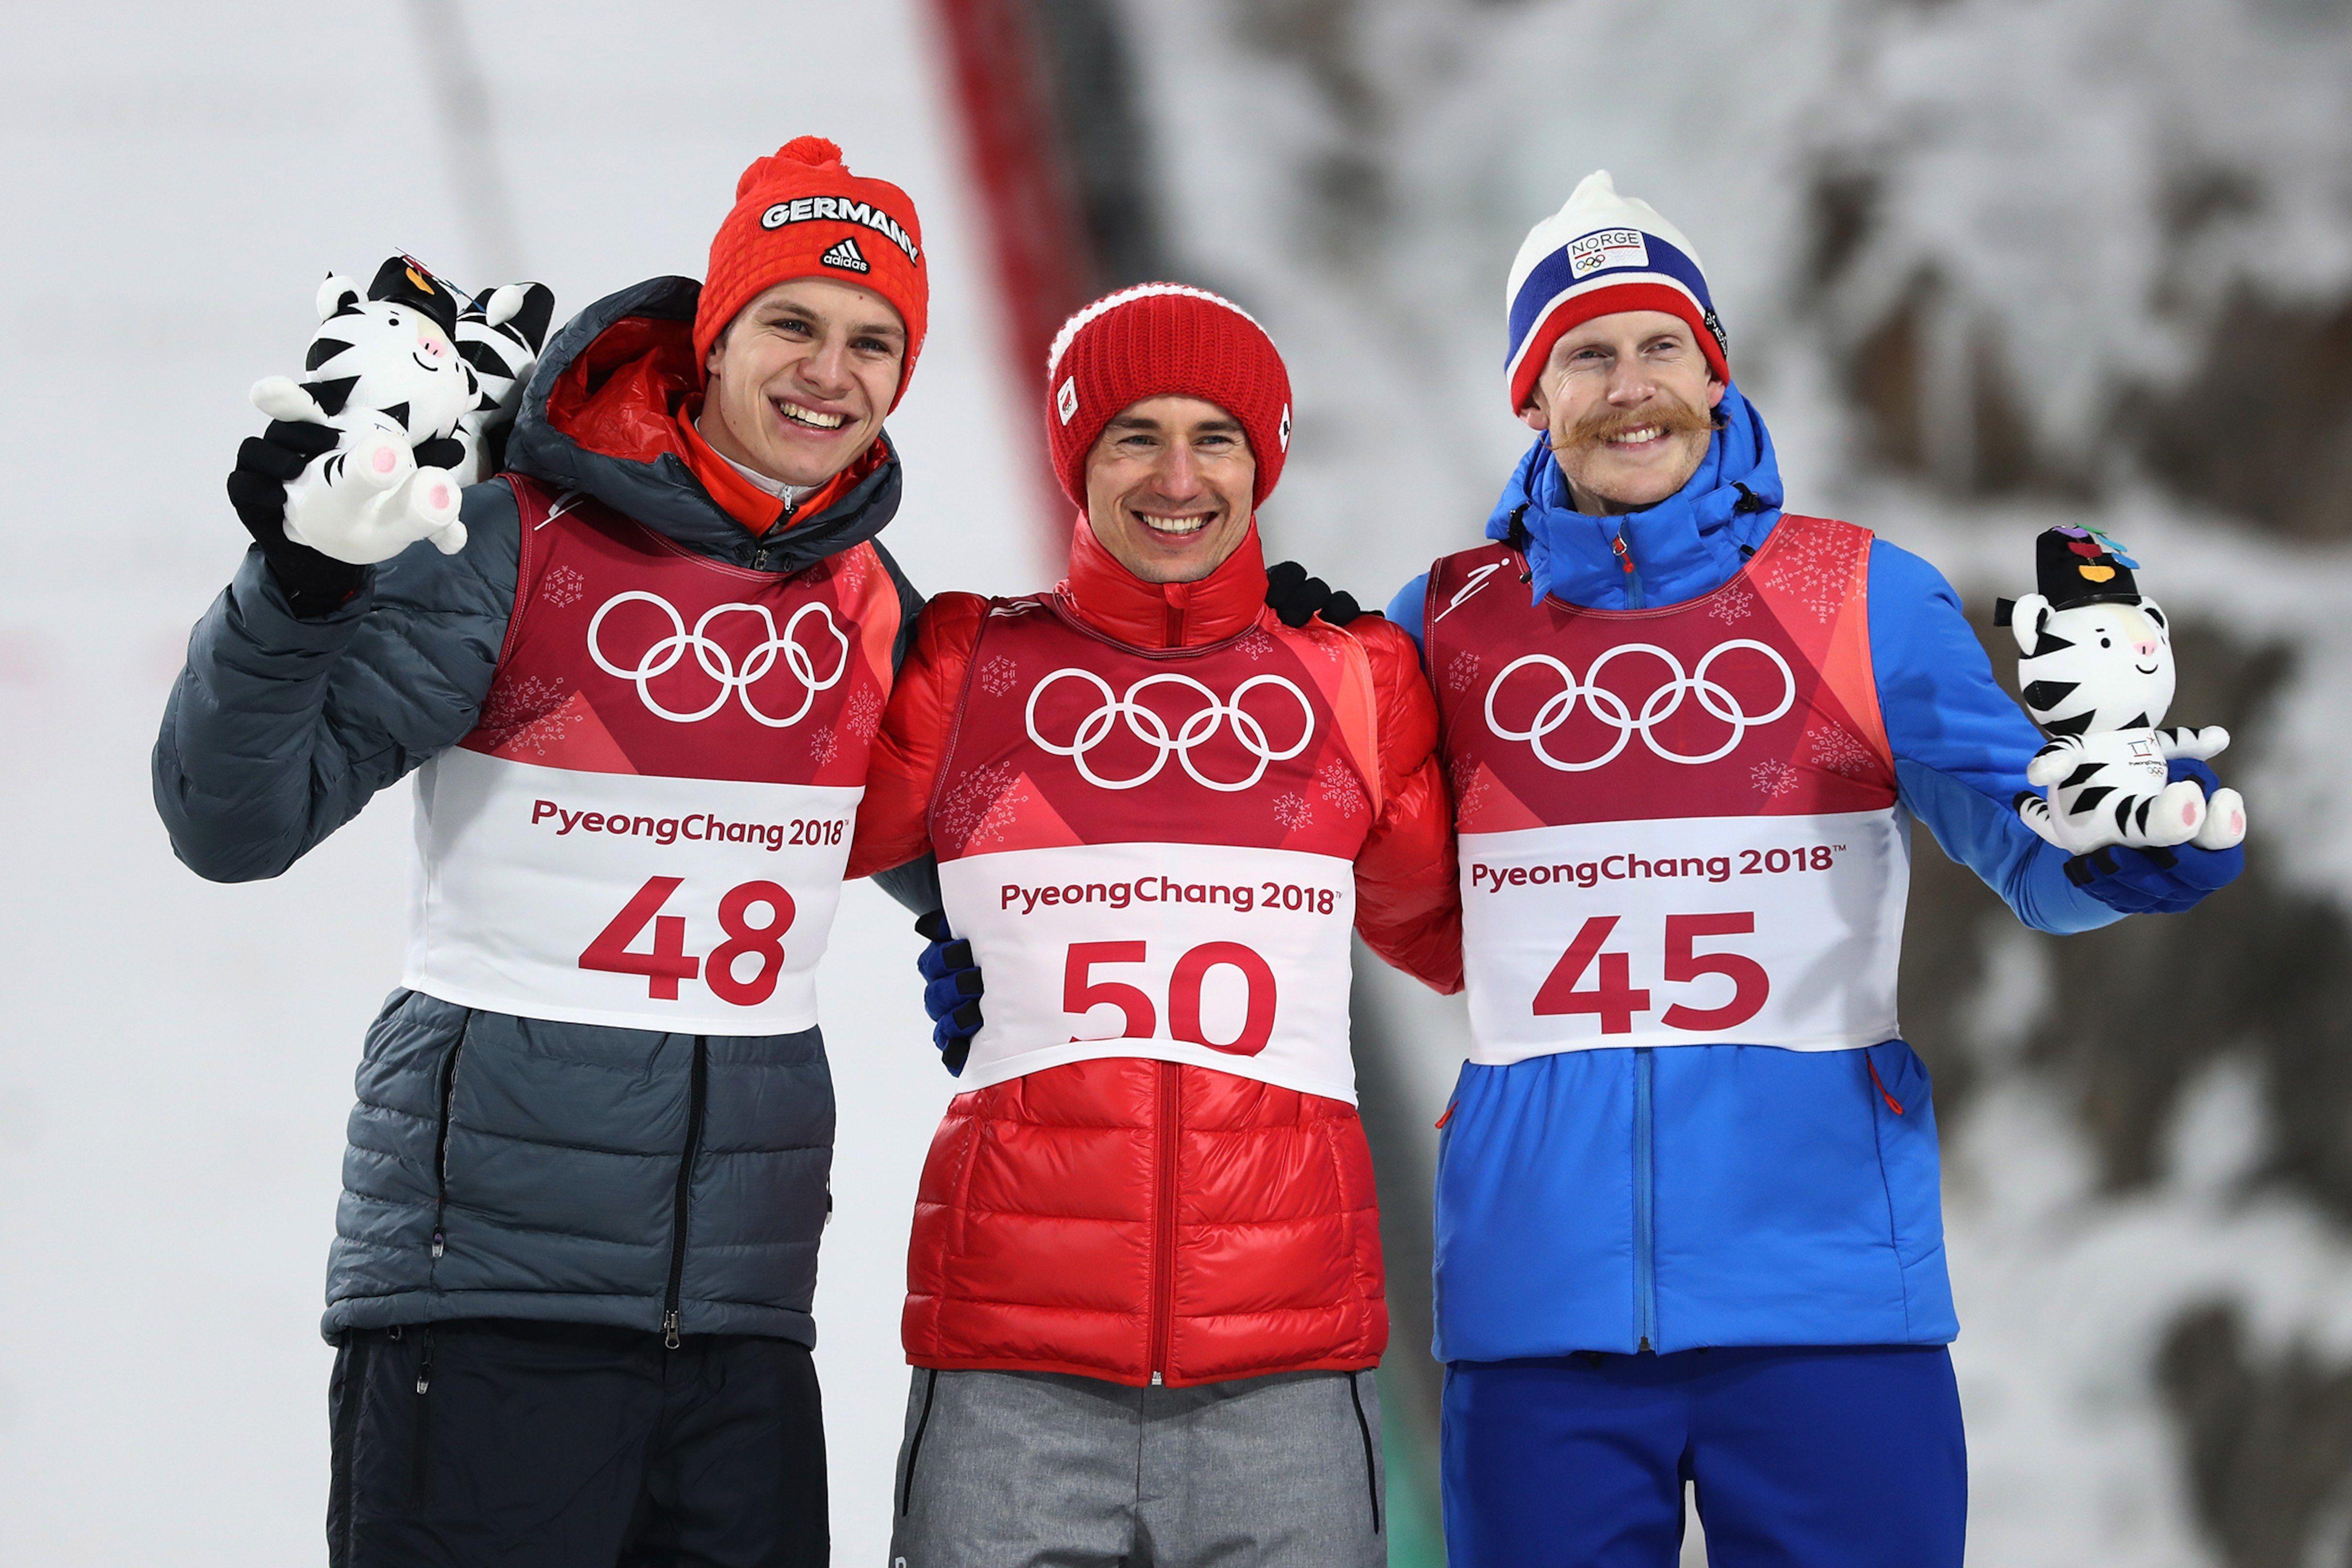 Ski Jump Men S Large Hill Gold Kamil Stoch Poland Silver Andreas Wellinger Germany Bronze Robert Johansson Ski Jumping Winter Olympics Ski Jumper